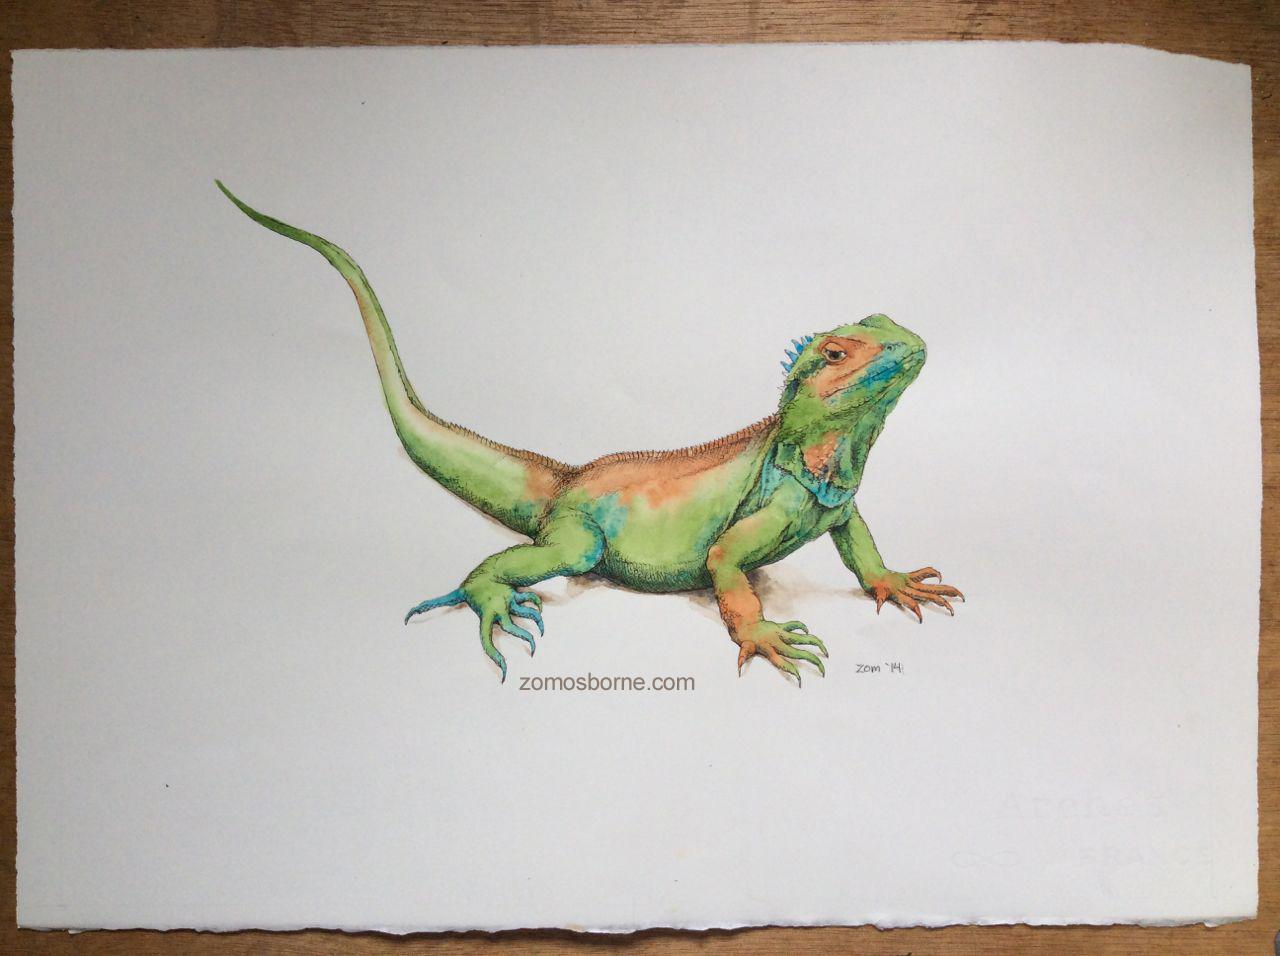 Drawn reptile garden lizard Birds water a by and